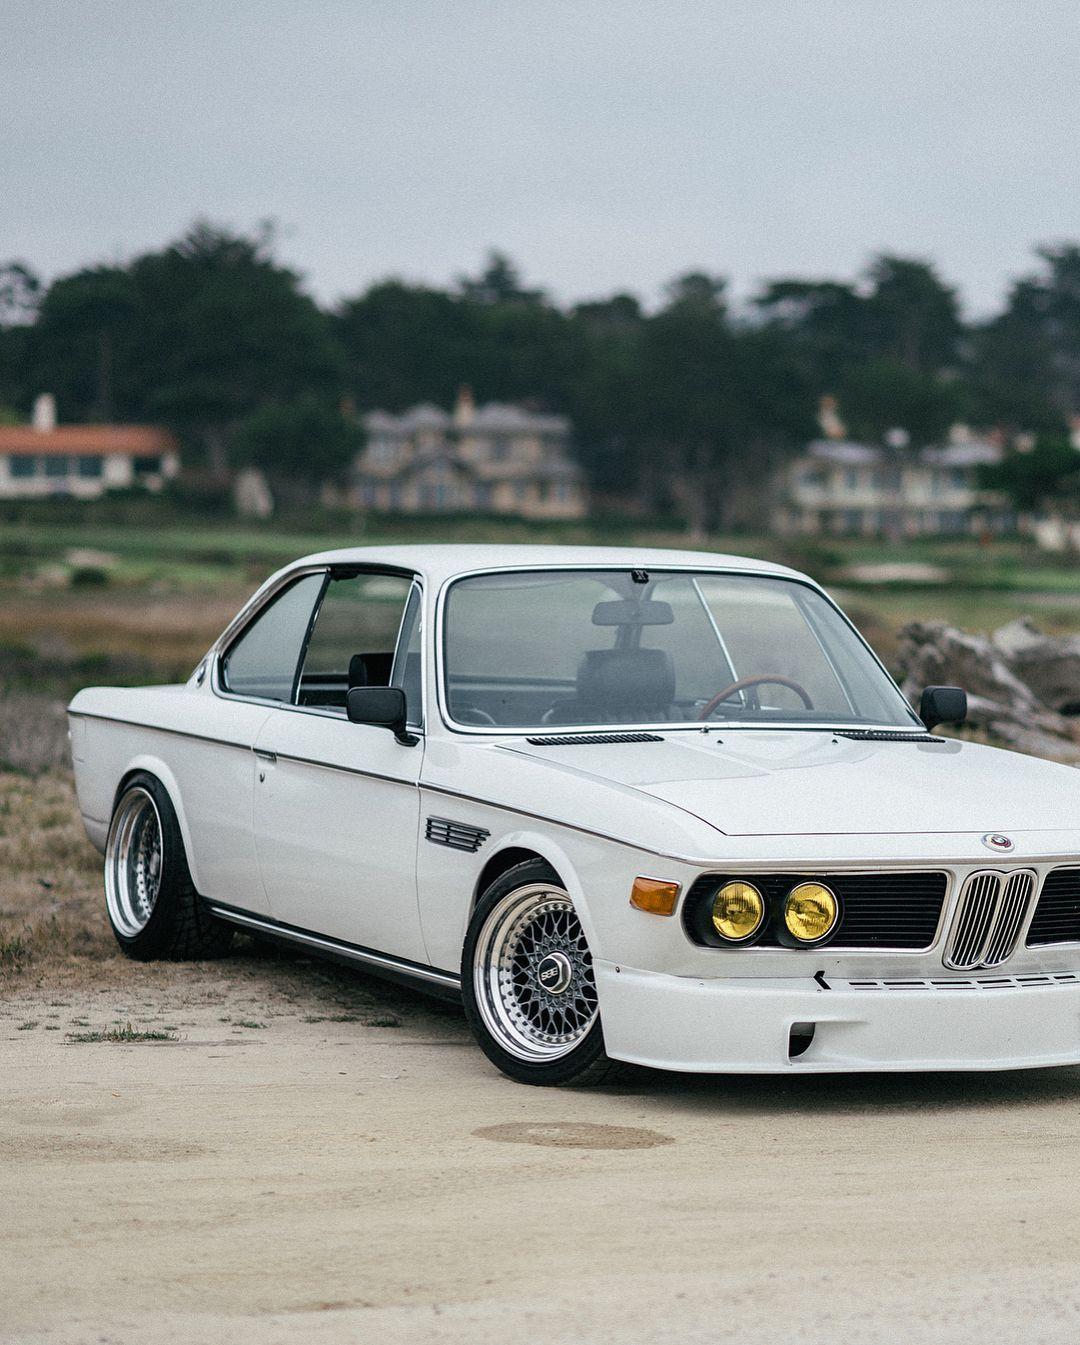 Bmw E9 3 0 Csi White Bmw Classic Cars Bmw Classic Bmw E9